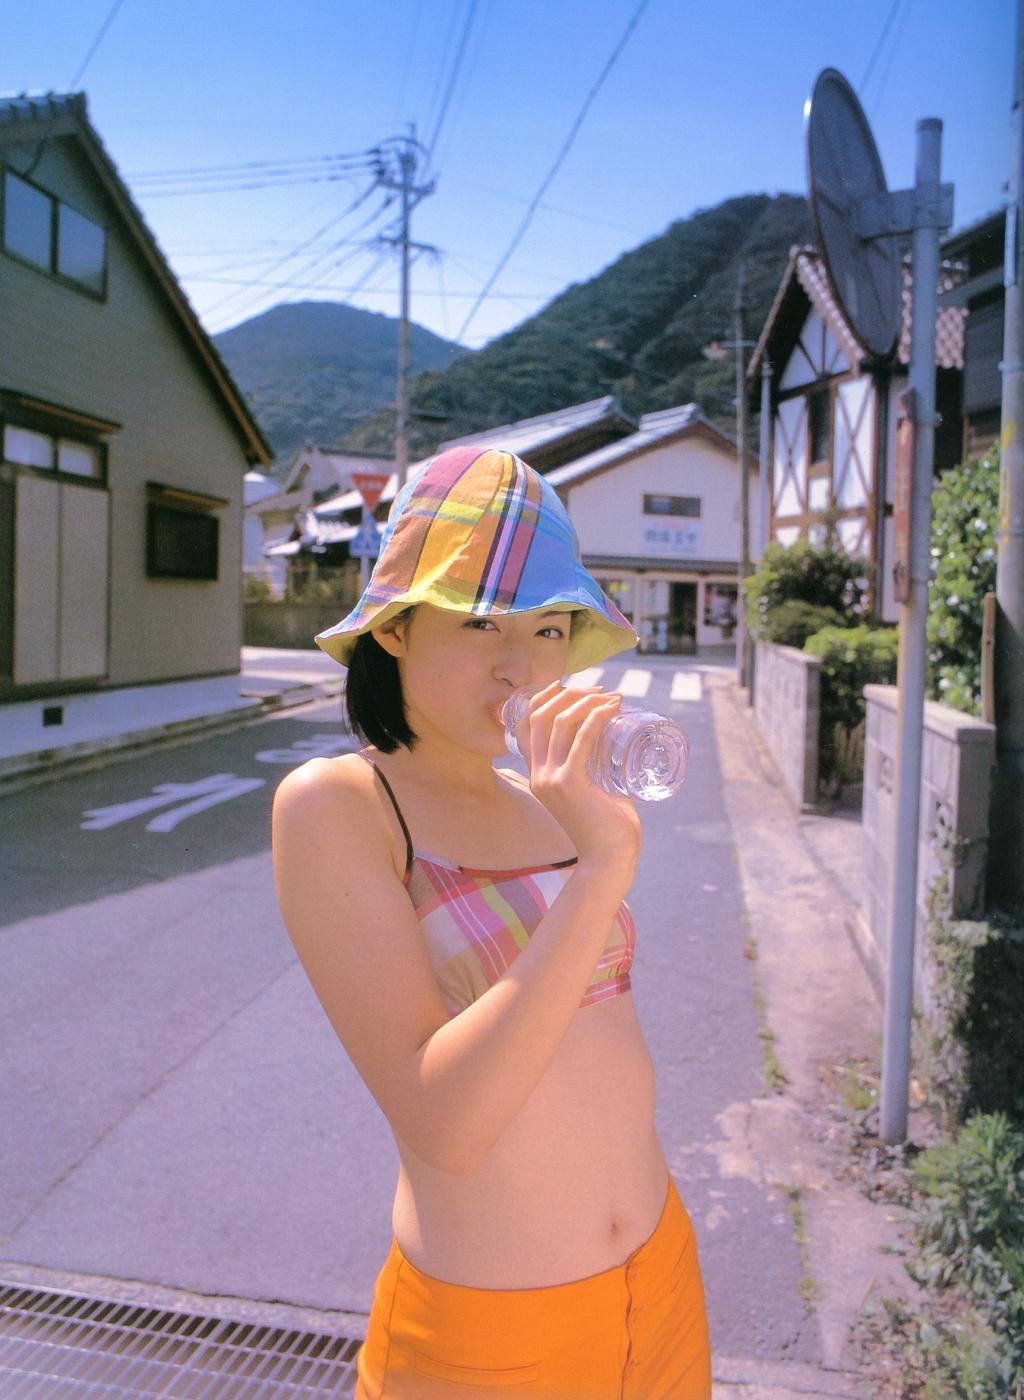 平井理央の画像 p1_30